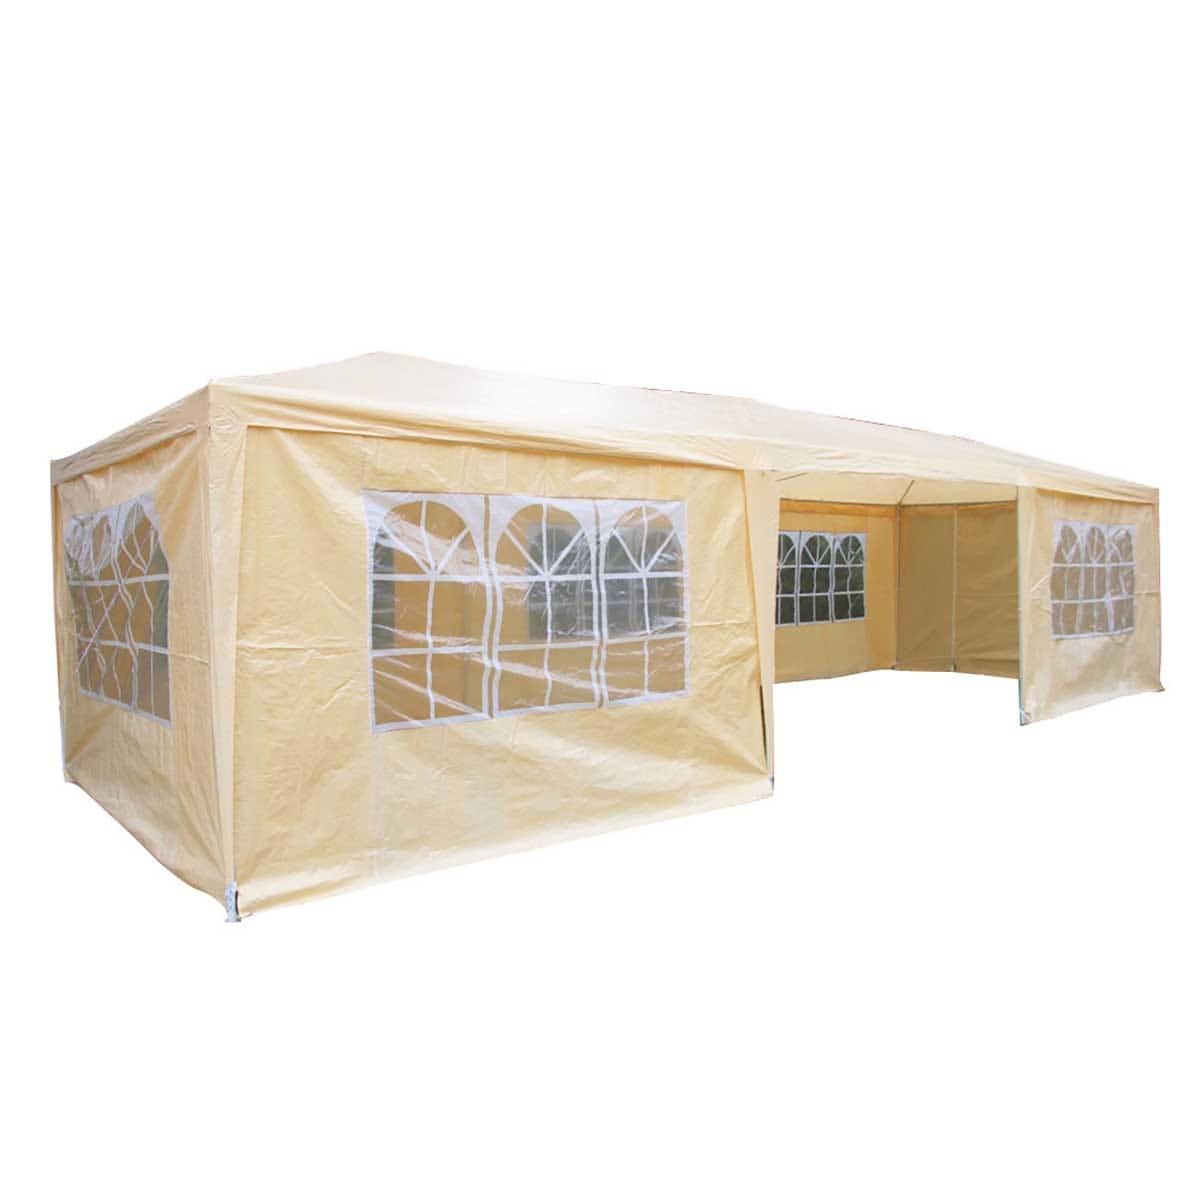 Airwave 9m x 3m Value Party Tent Gazebo - Beige